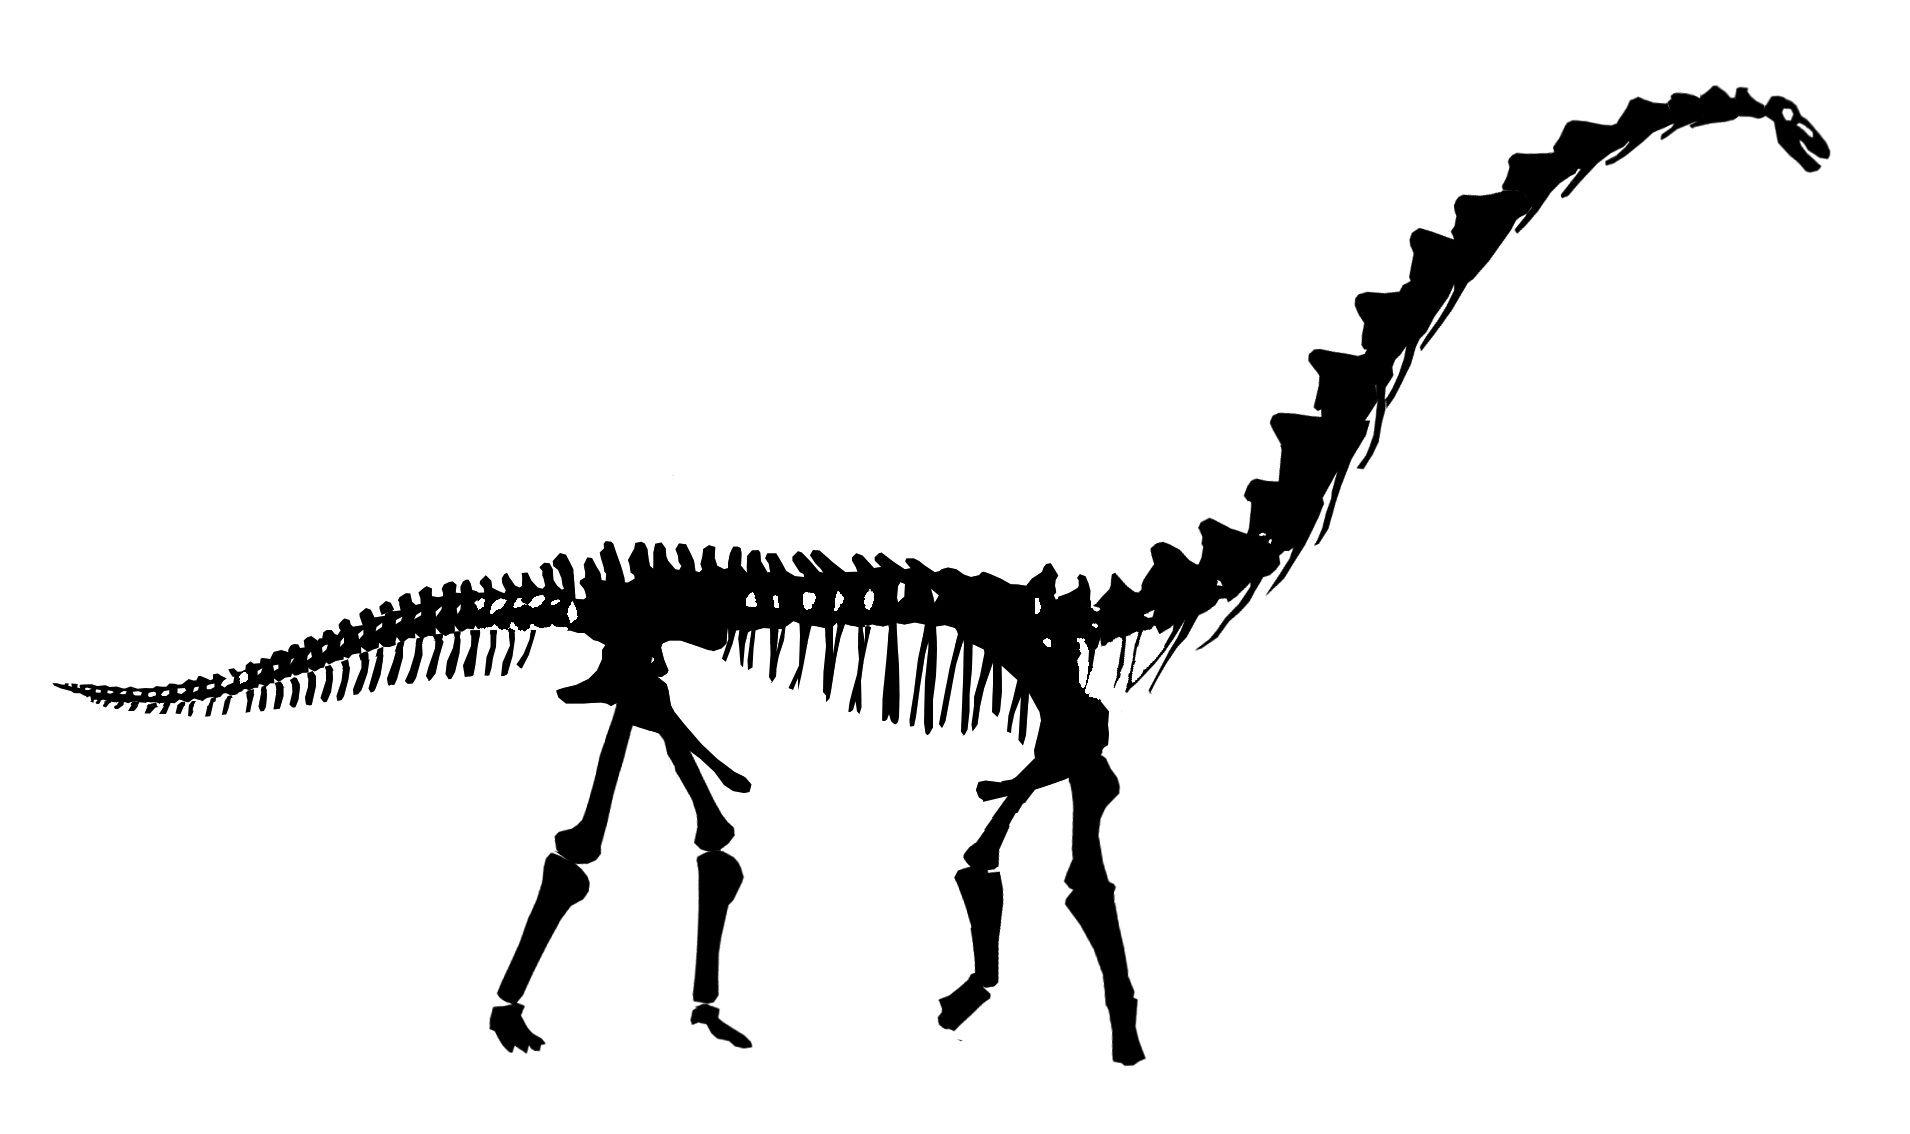 Appendicular Skeleton Diagram Fossil Bones Skeleton Silhouette